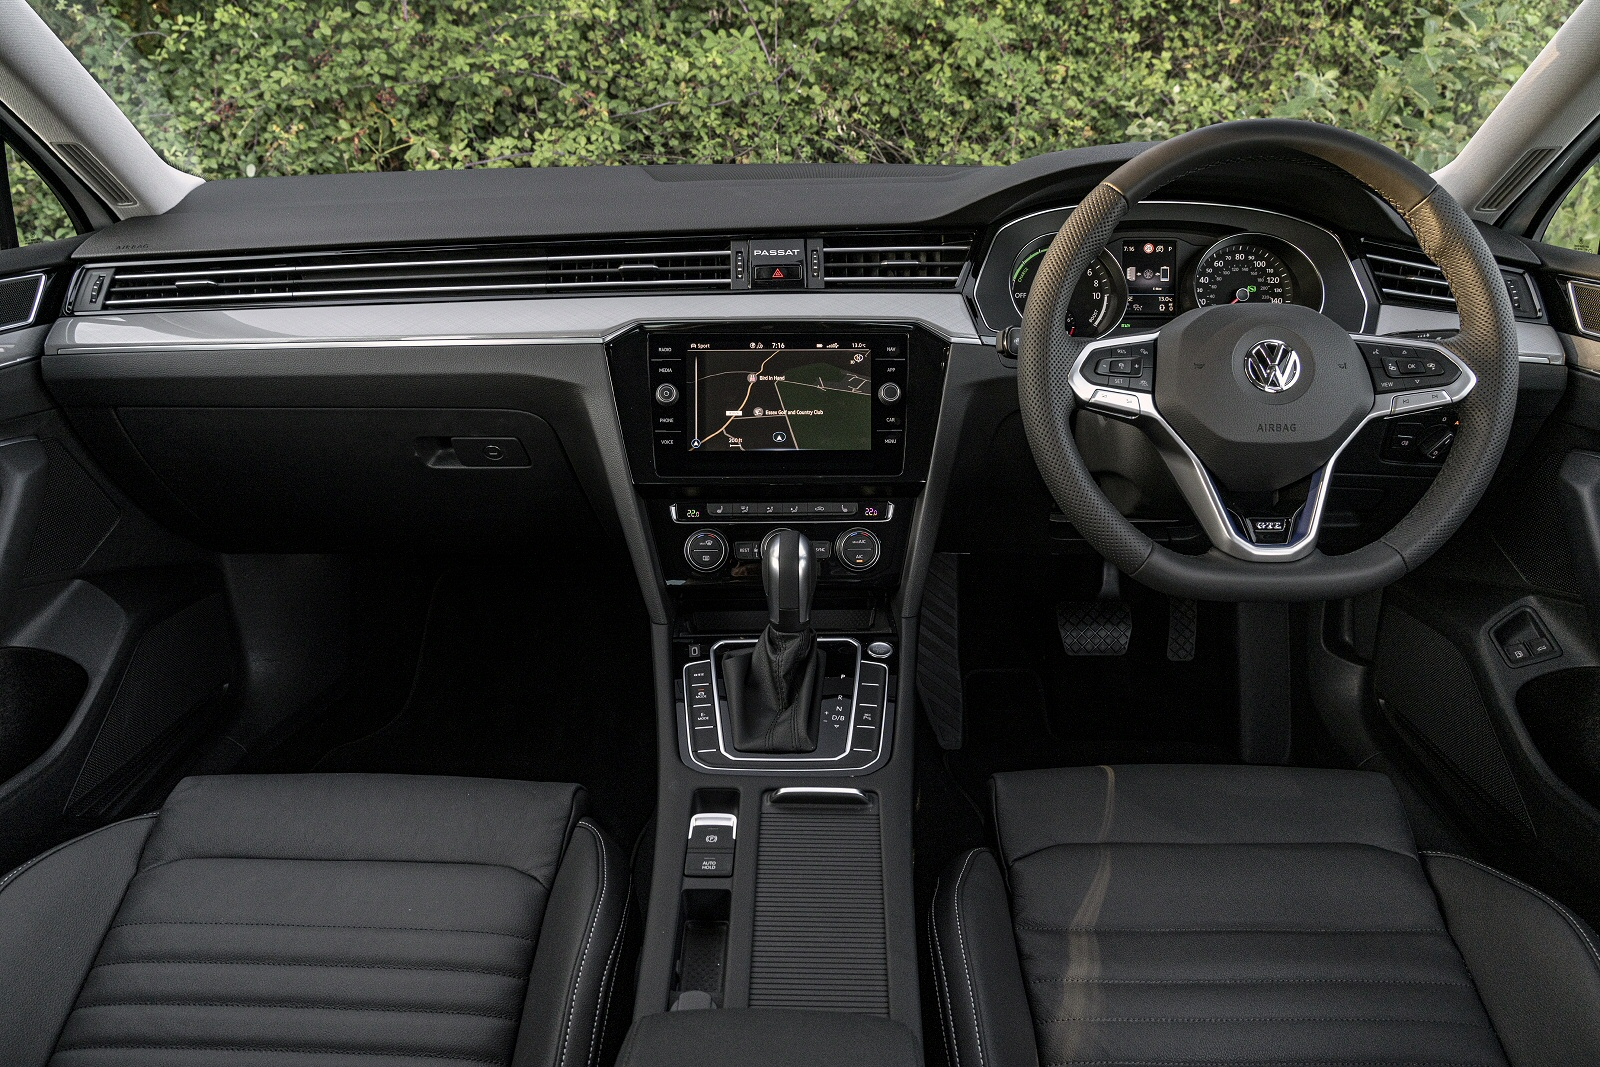 Volkswagen Passat GTE Saloon 1.4 TSI (218ps) GTE Advance DSG